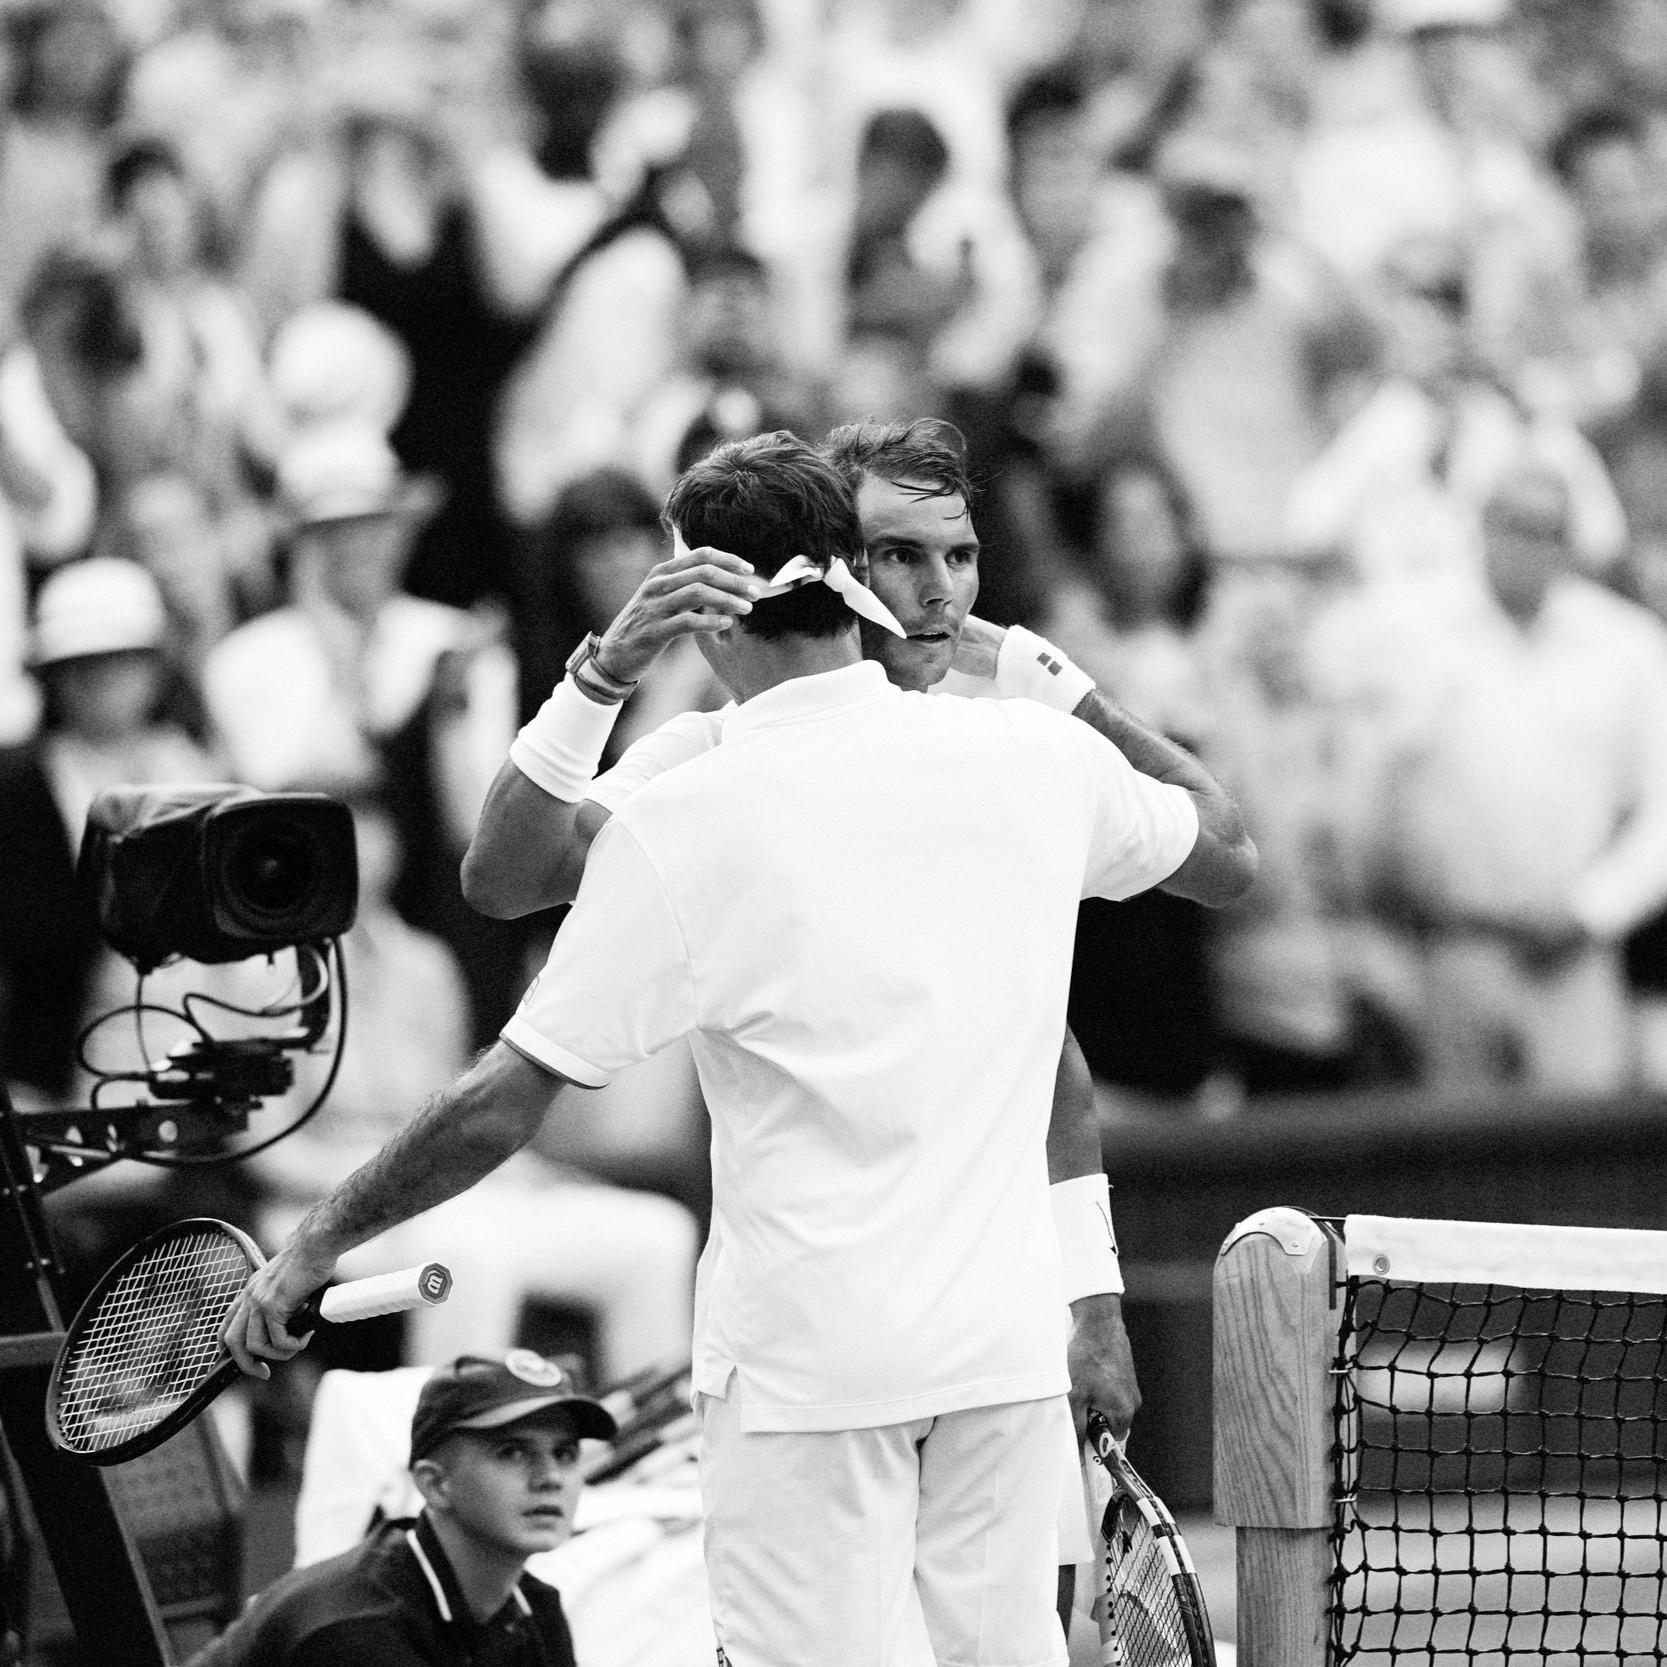 Wimbledon_New_York_Times_Stockdale72.jpg